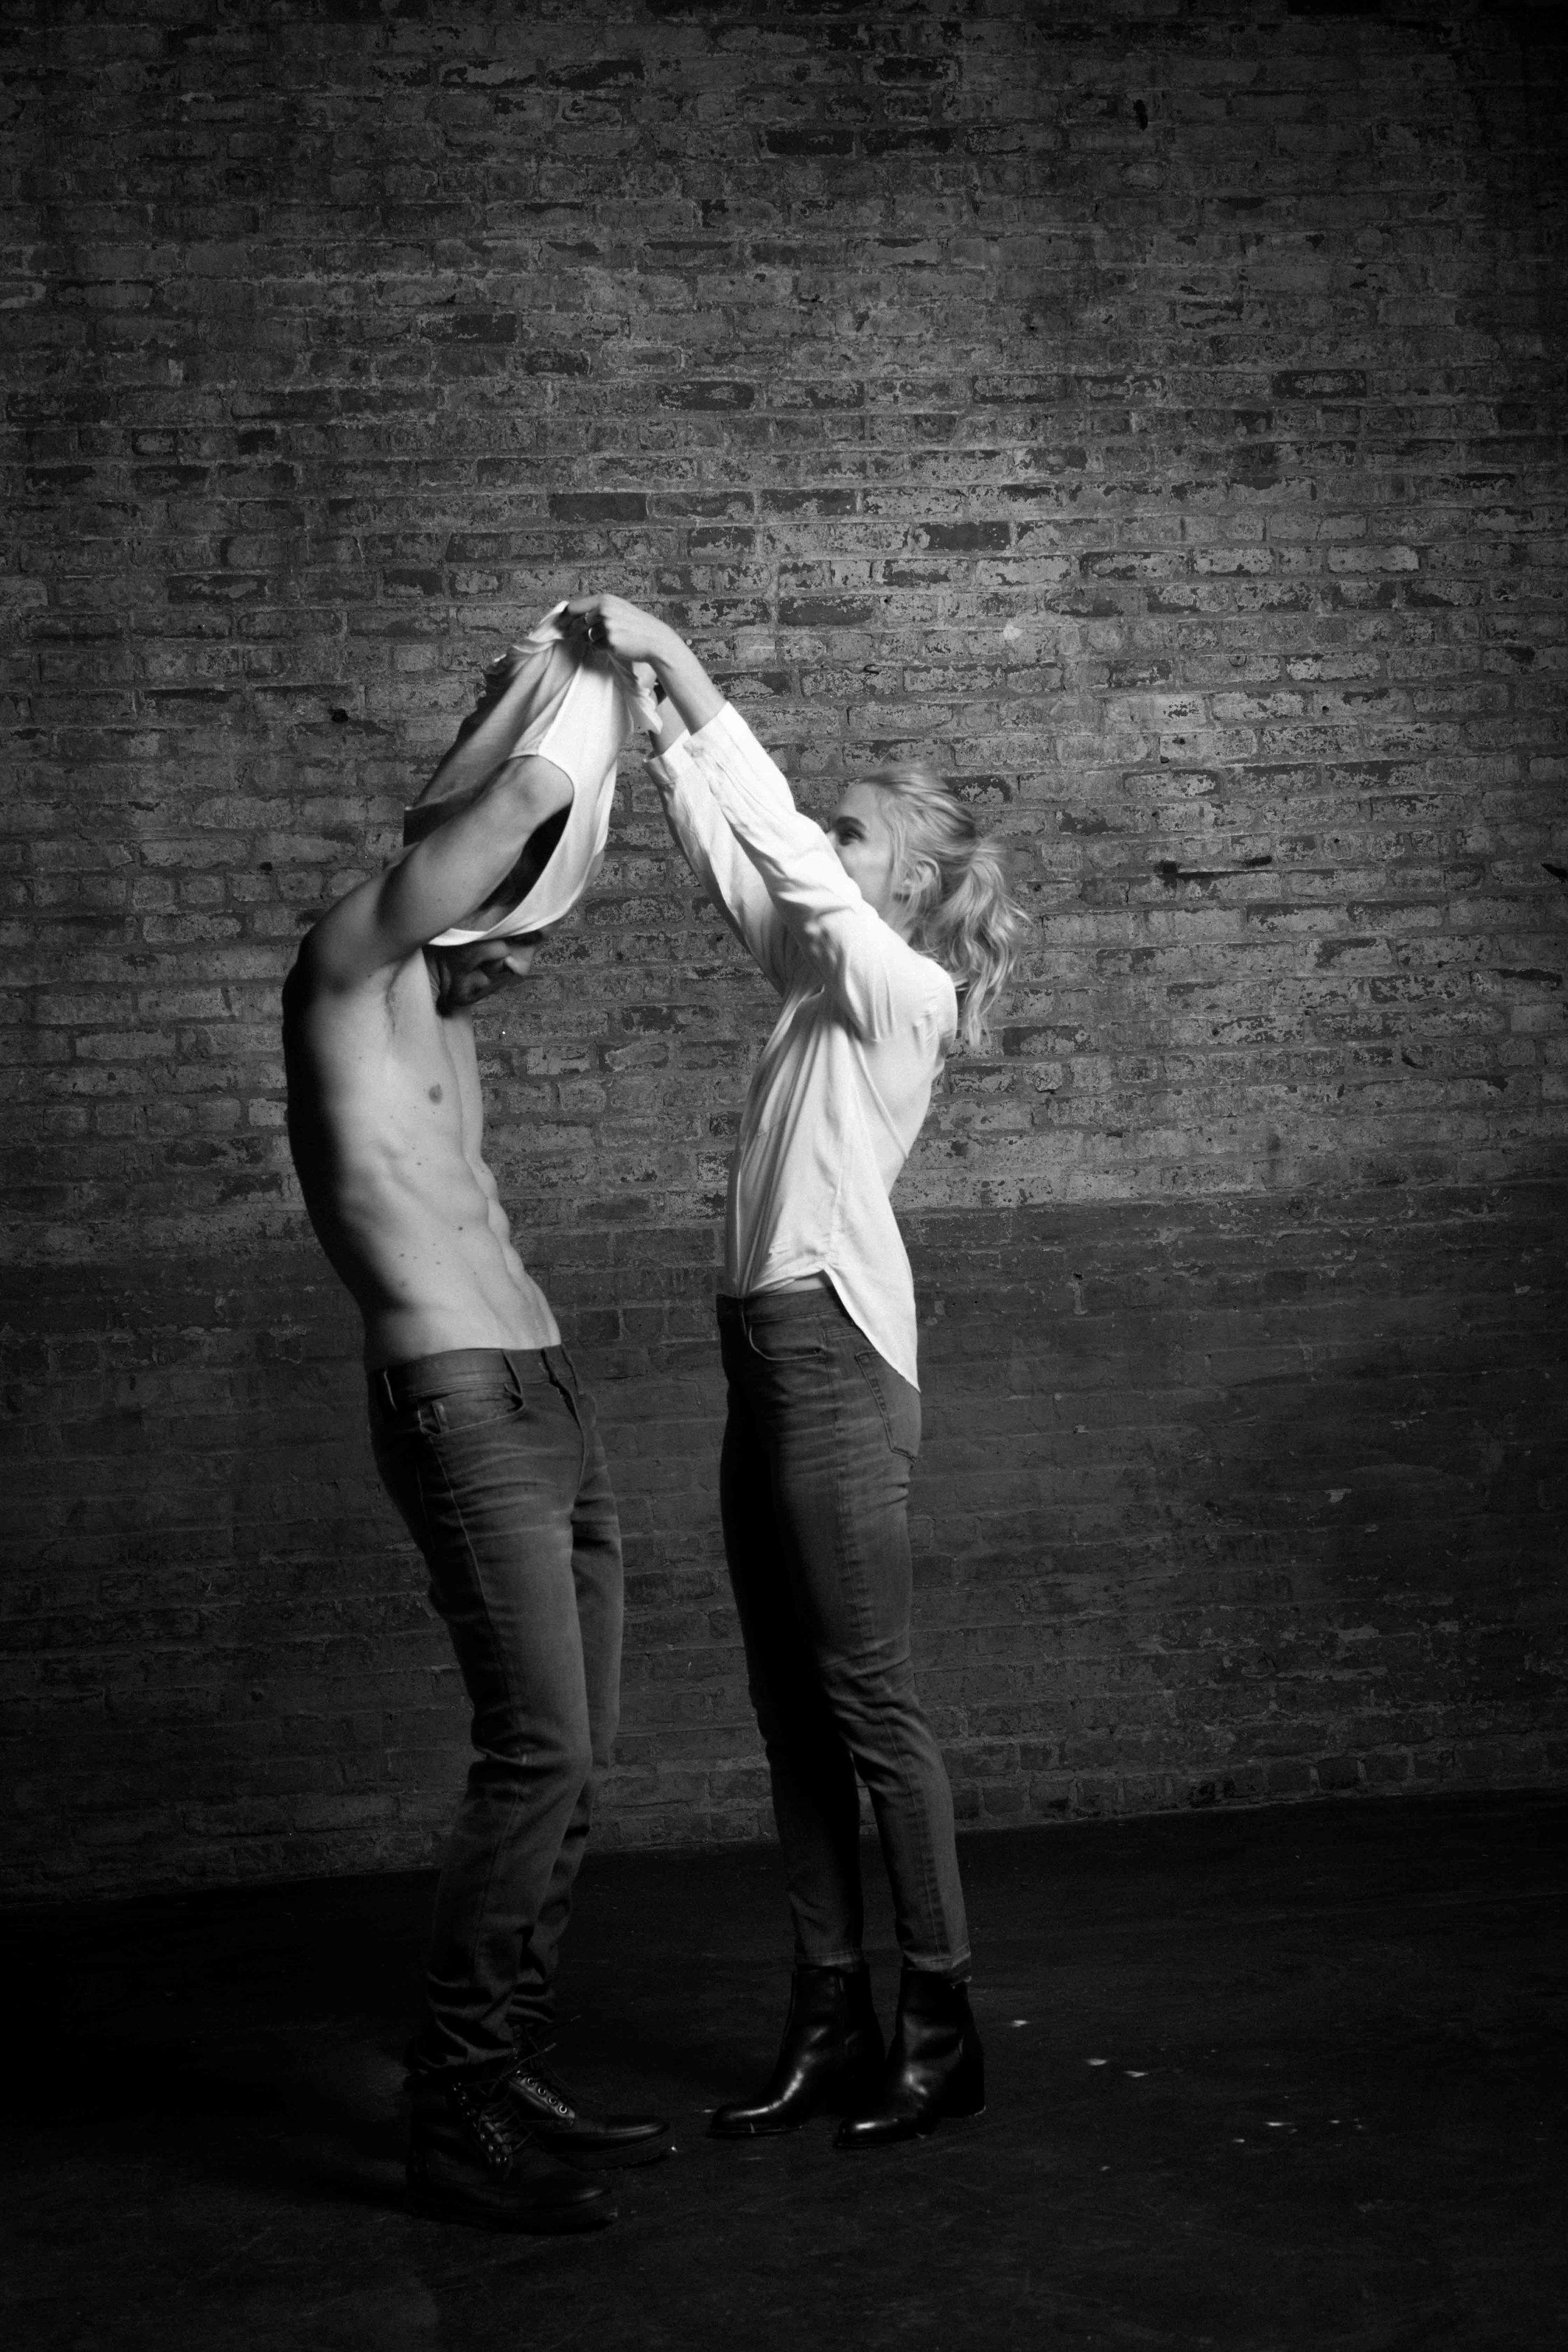 Claire Wustenberg and Emanuelle Fiore